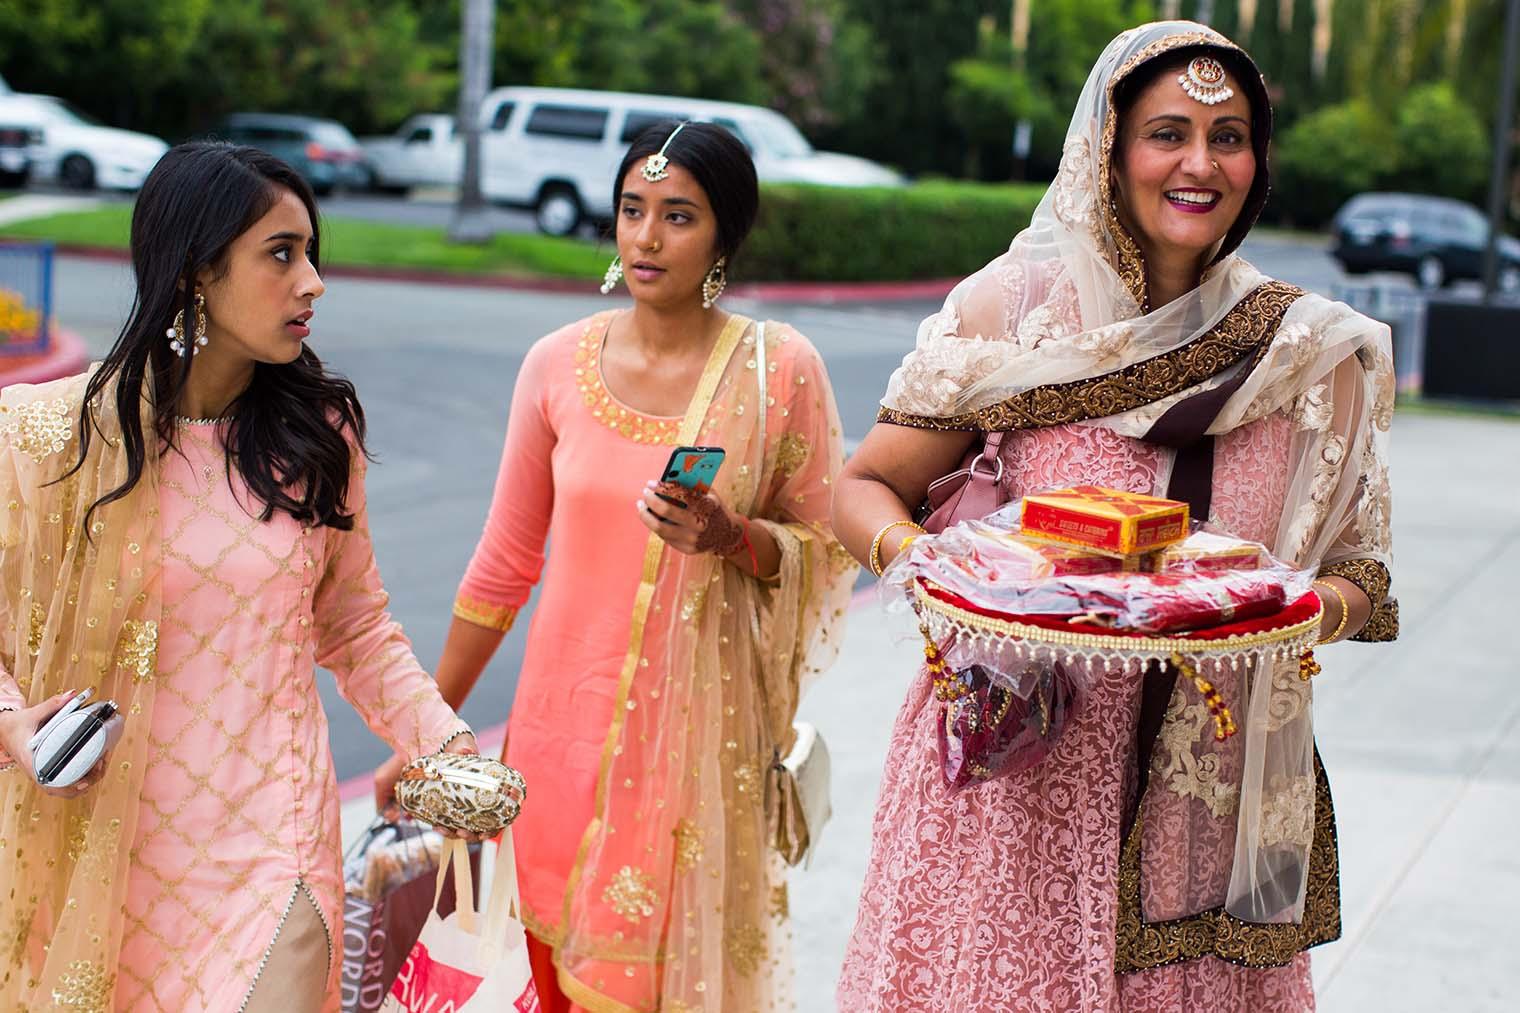 Wedding Guests at Gurdwara Sahib of Fremont